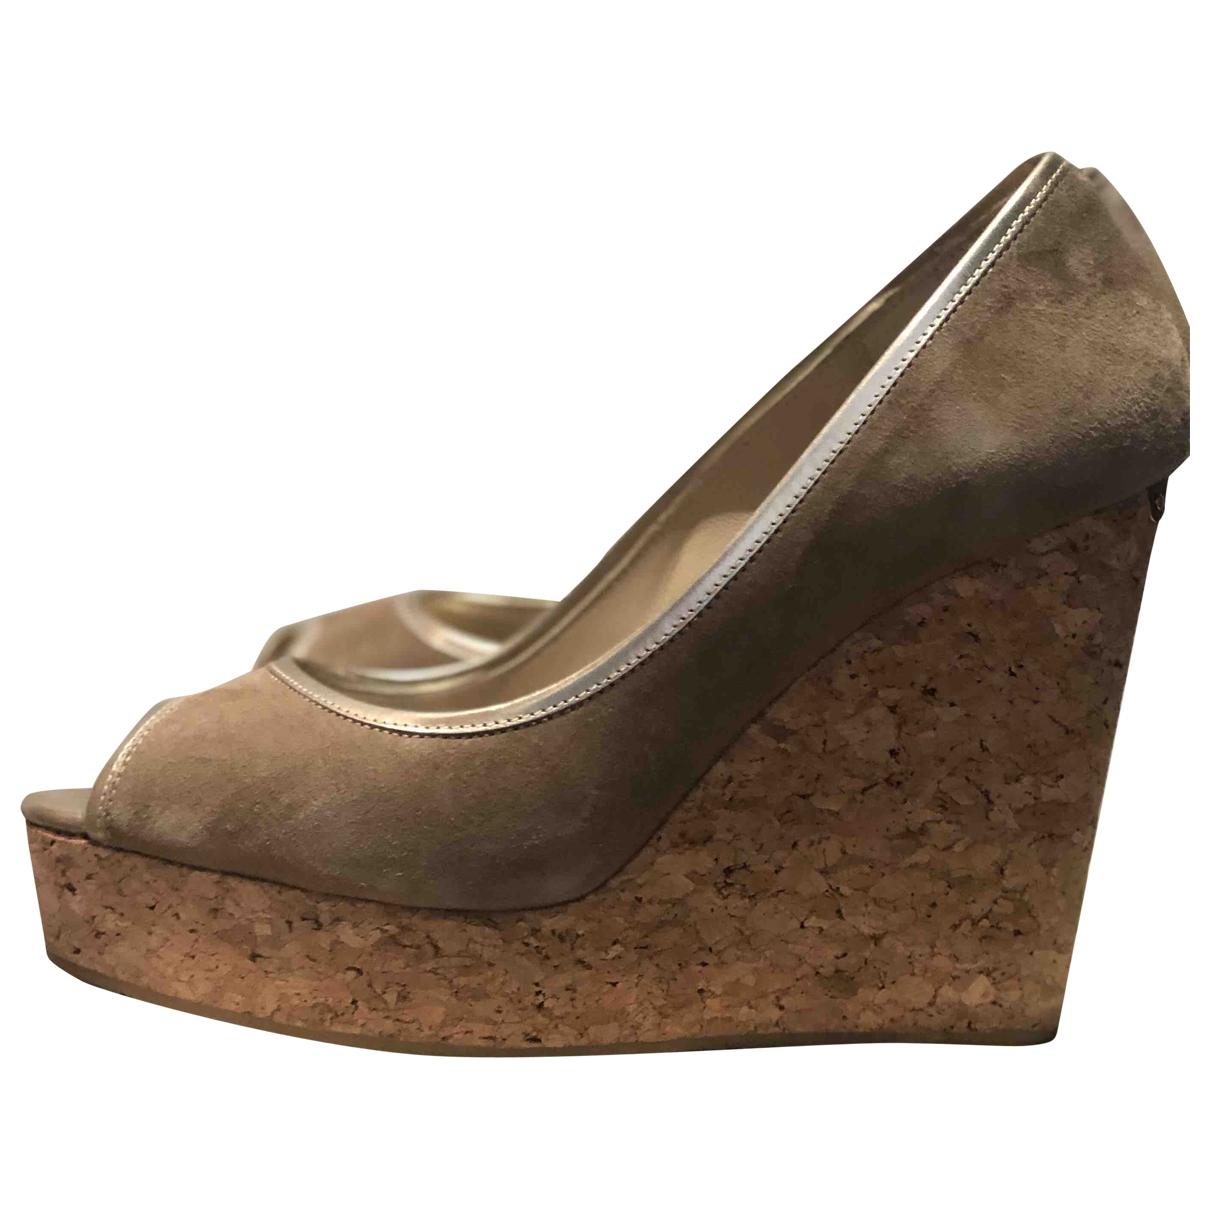 Jimmy Choo \N Beige Suede Sandals for Women 39.5 EU